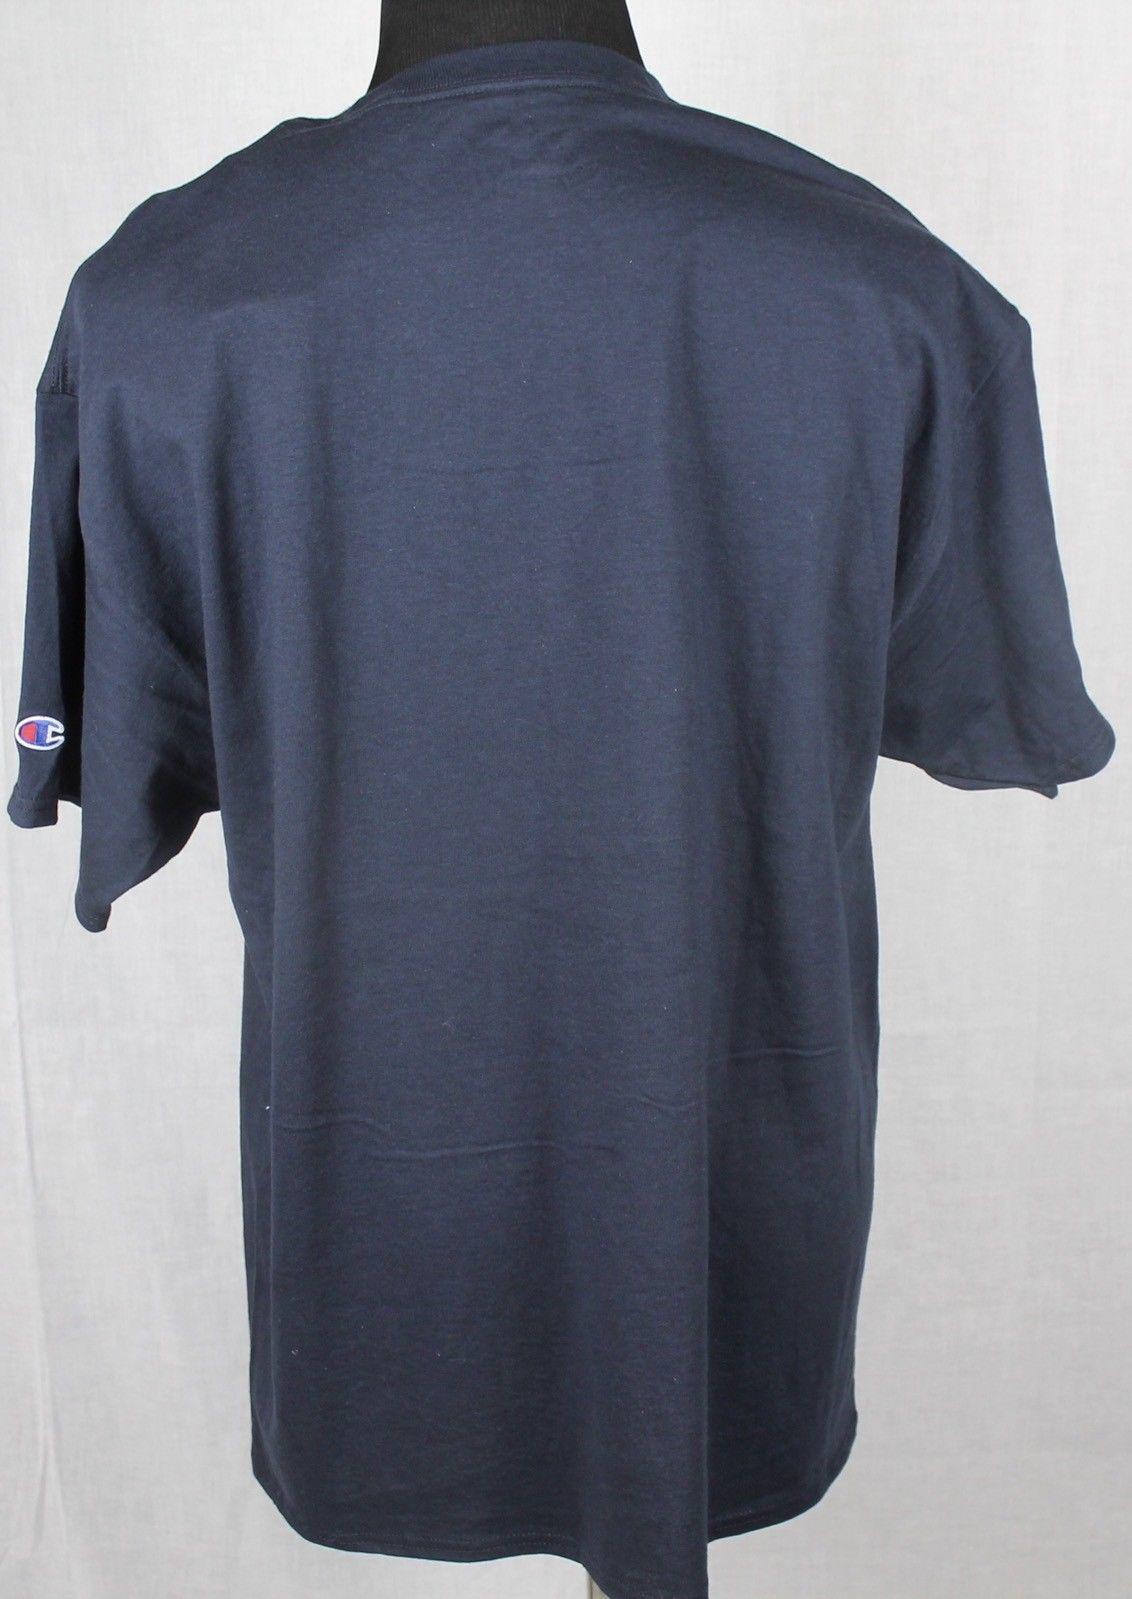 Champion Utah State Mens Short Sleeve T-Shirt sz XL Blue image 4